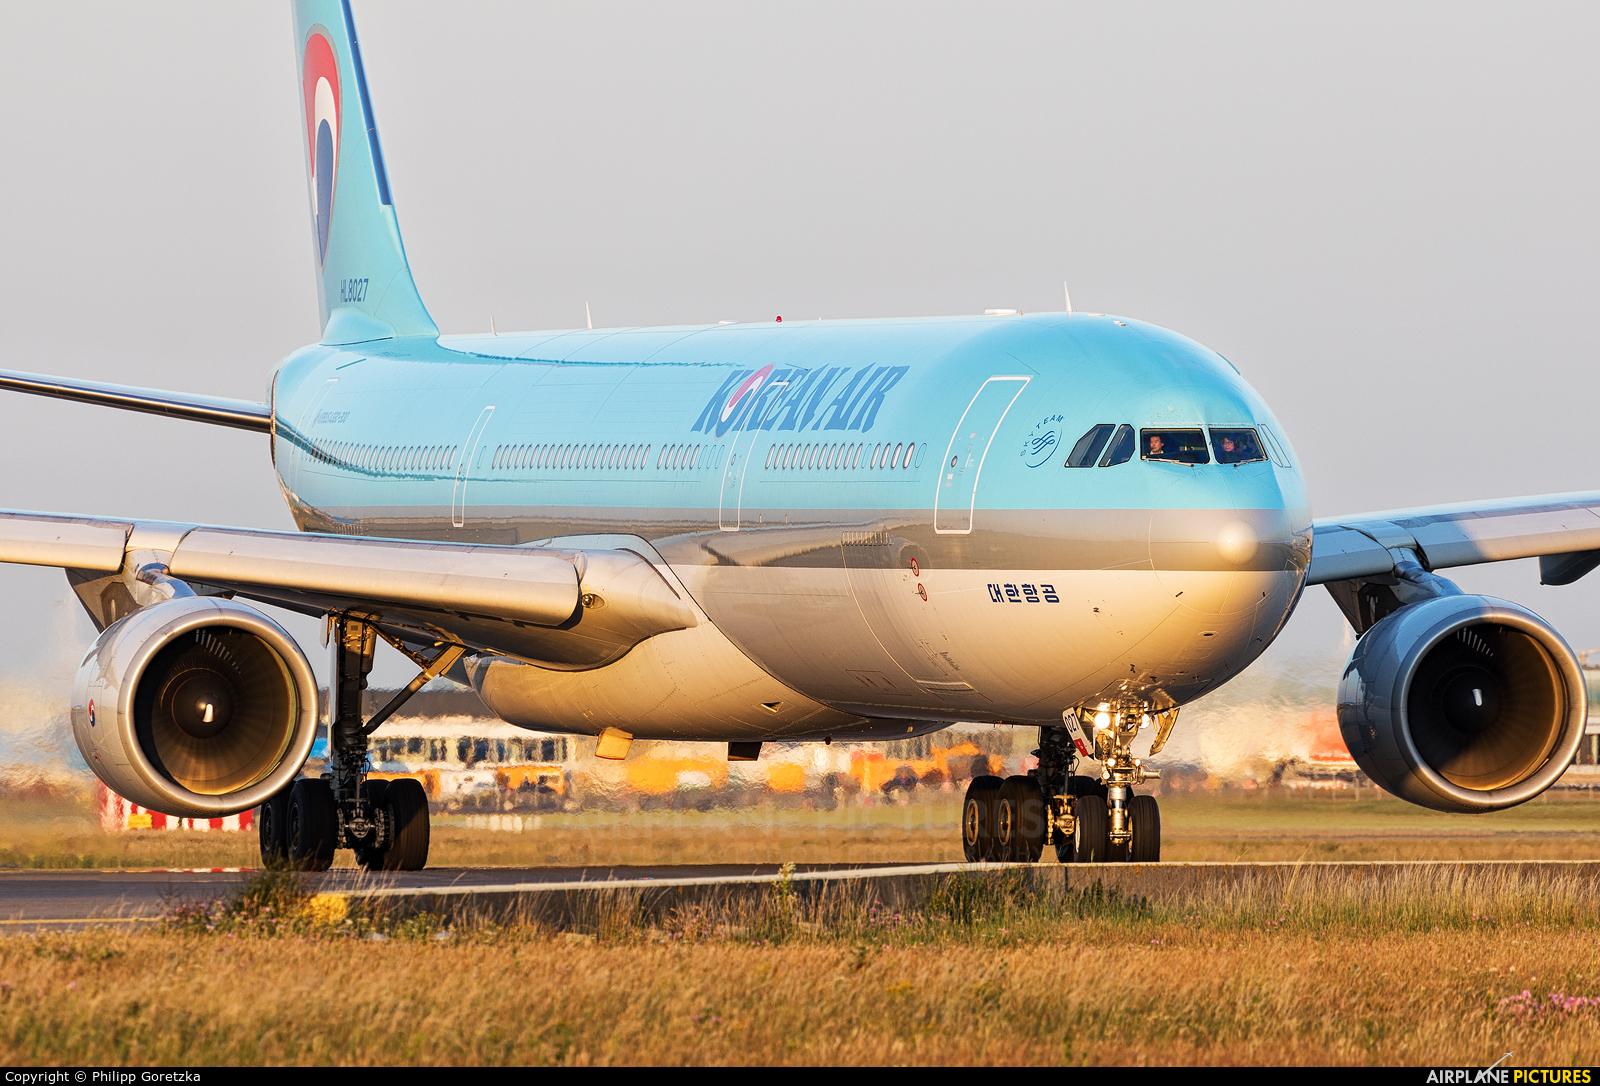 Korean Air HL8027 aircraft at Amsterdam - Schiphol